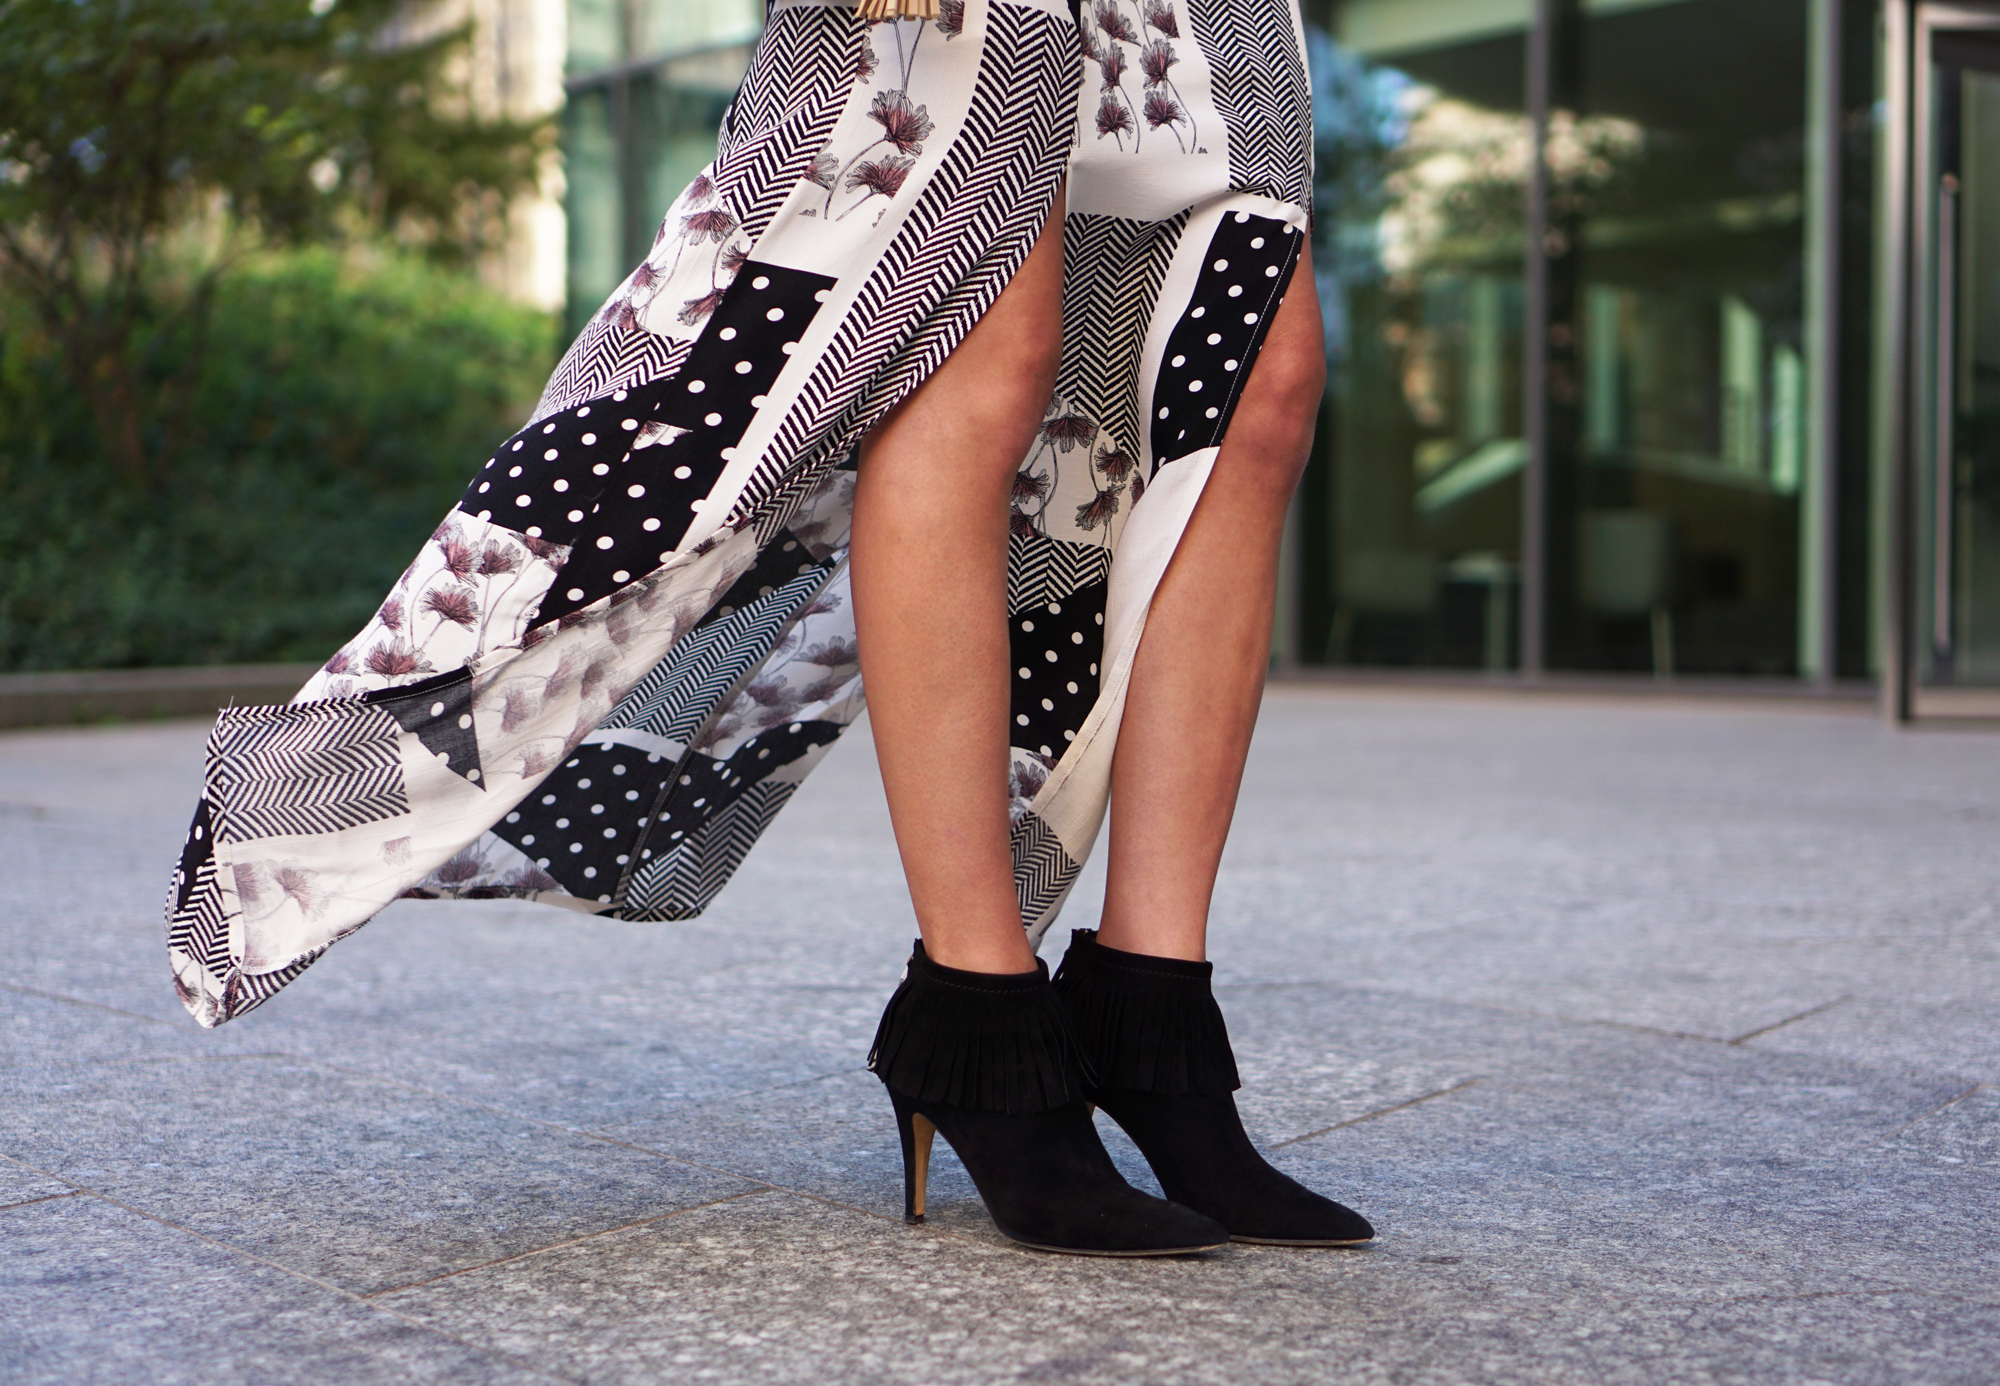 the_dandy_liar_top_shop_skirt_02